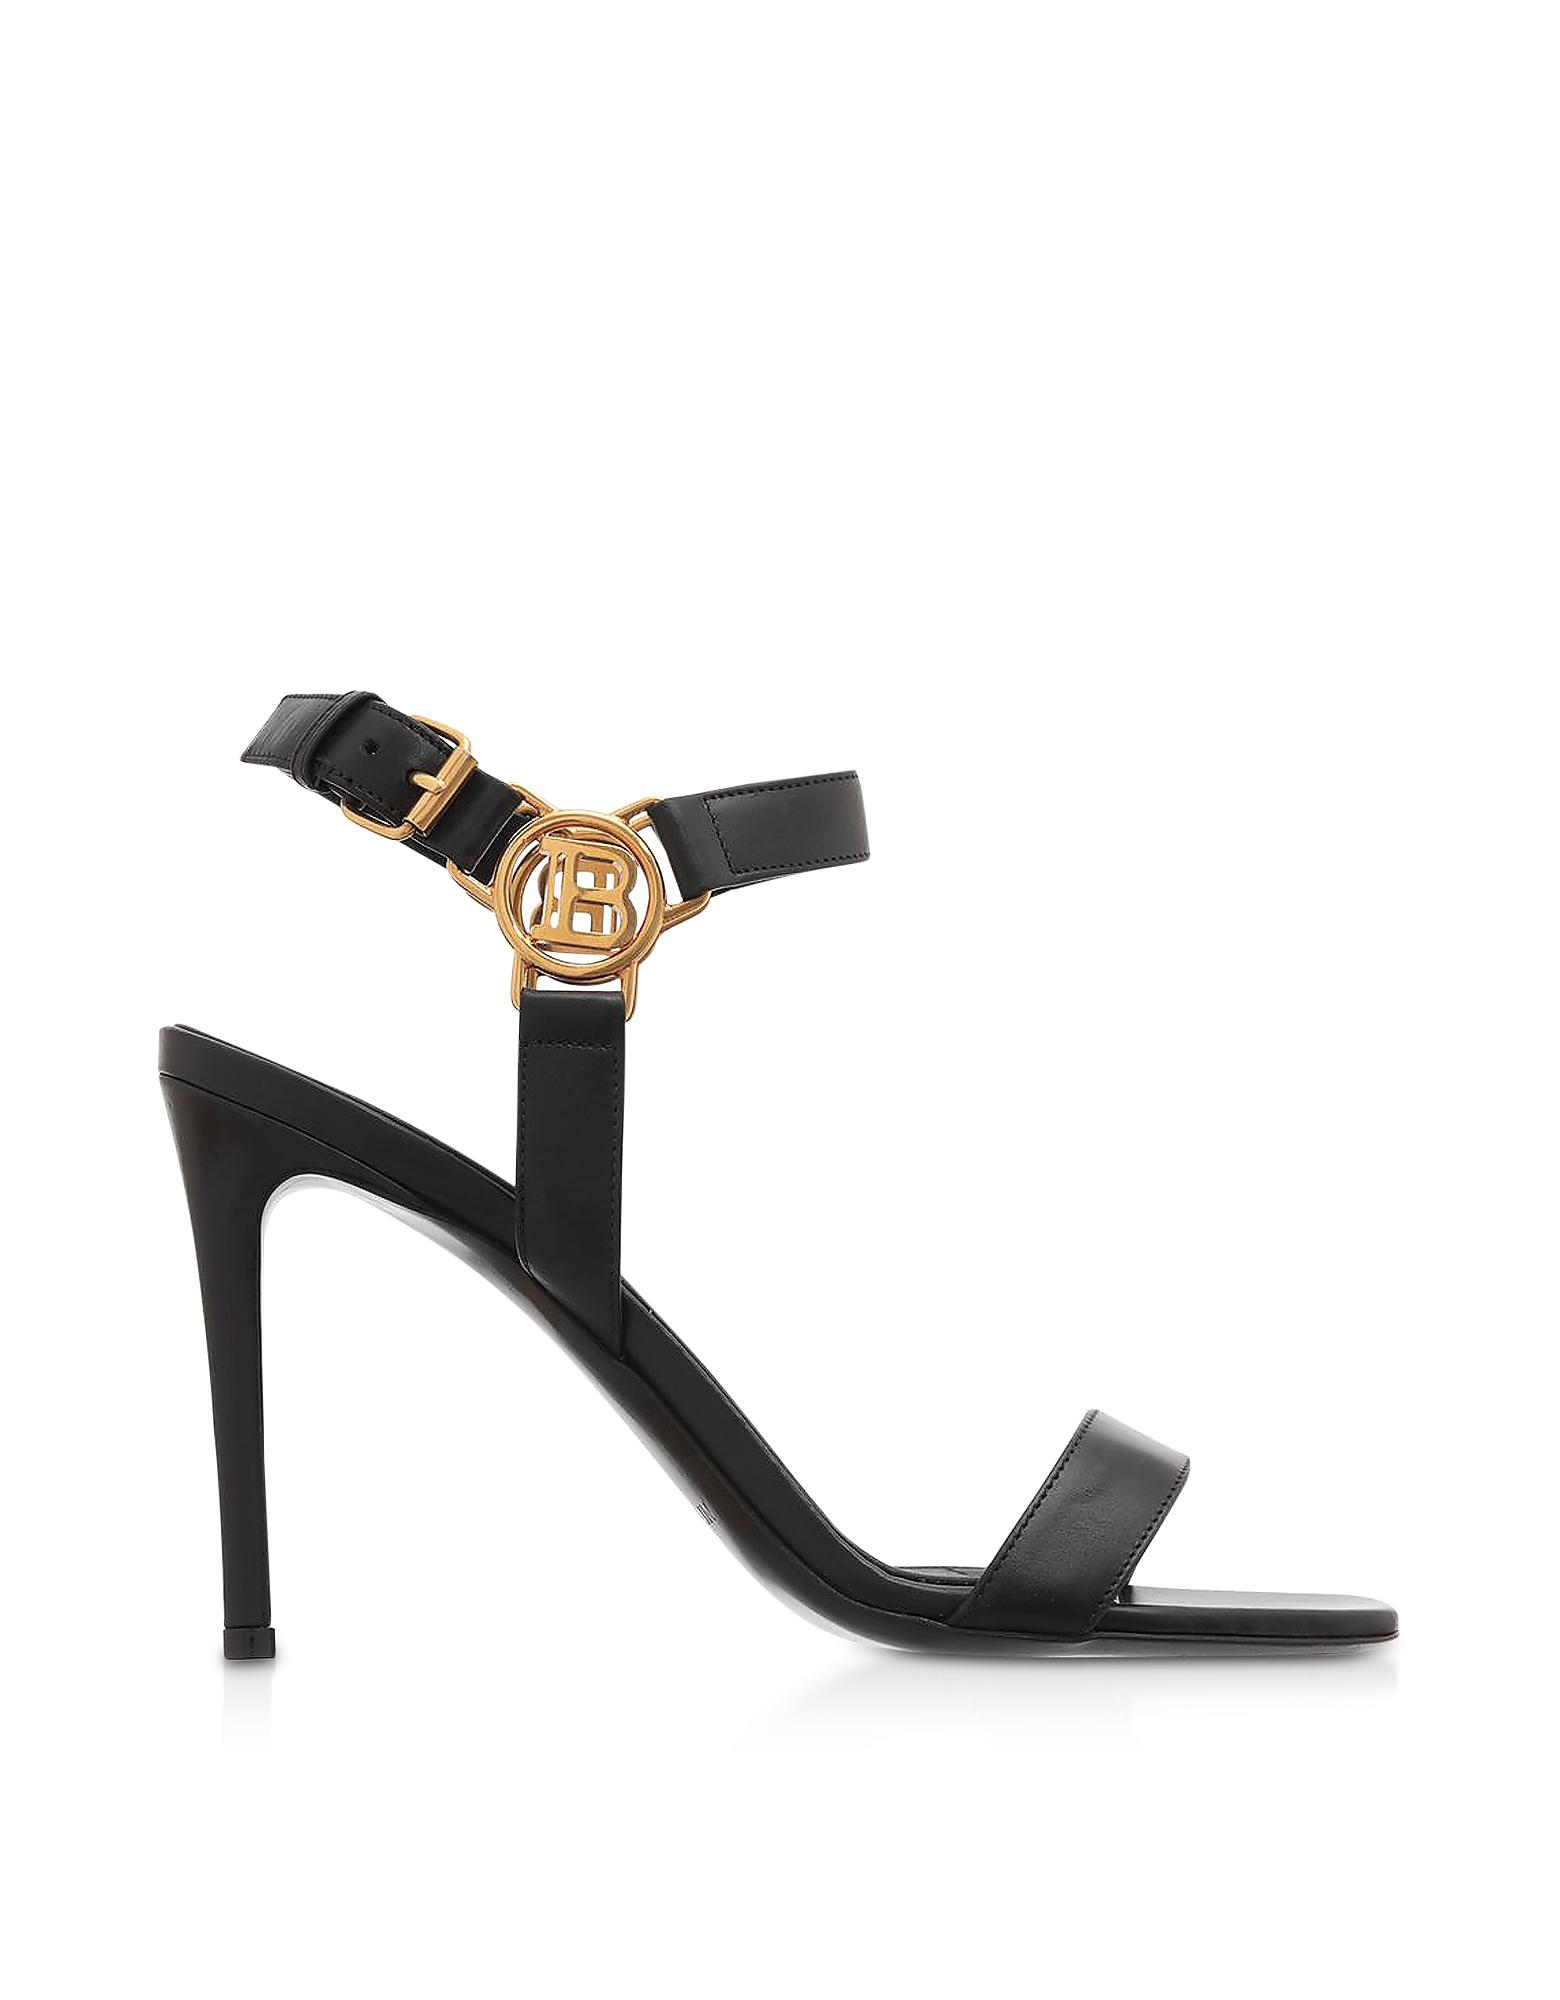 Balmain Designer Shoes, Black Leather High Heel Sandals